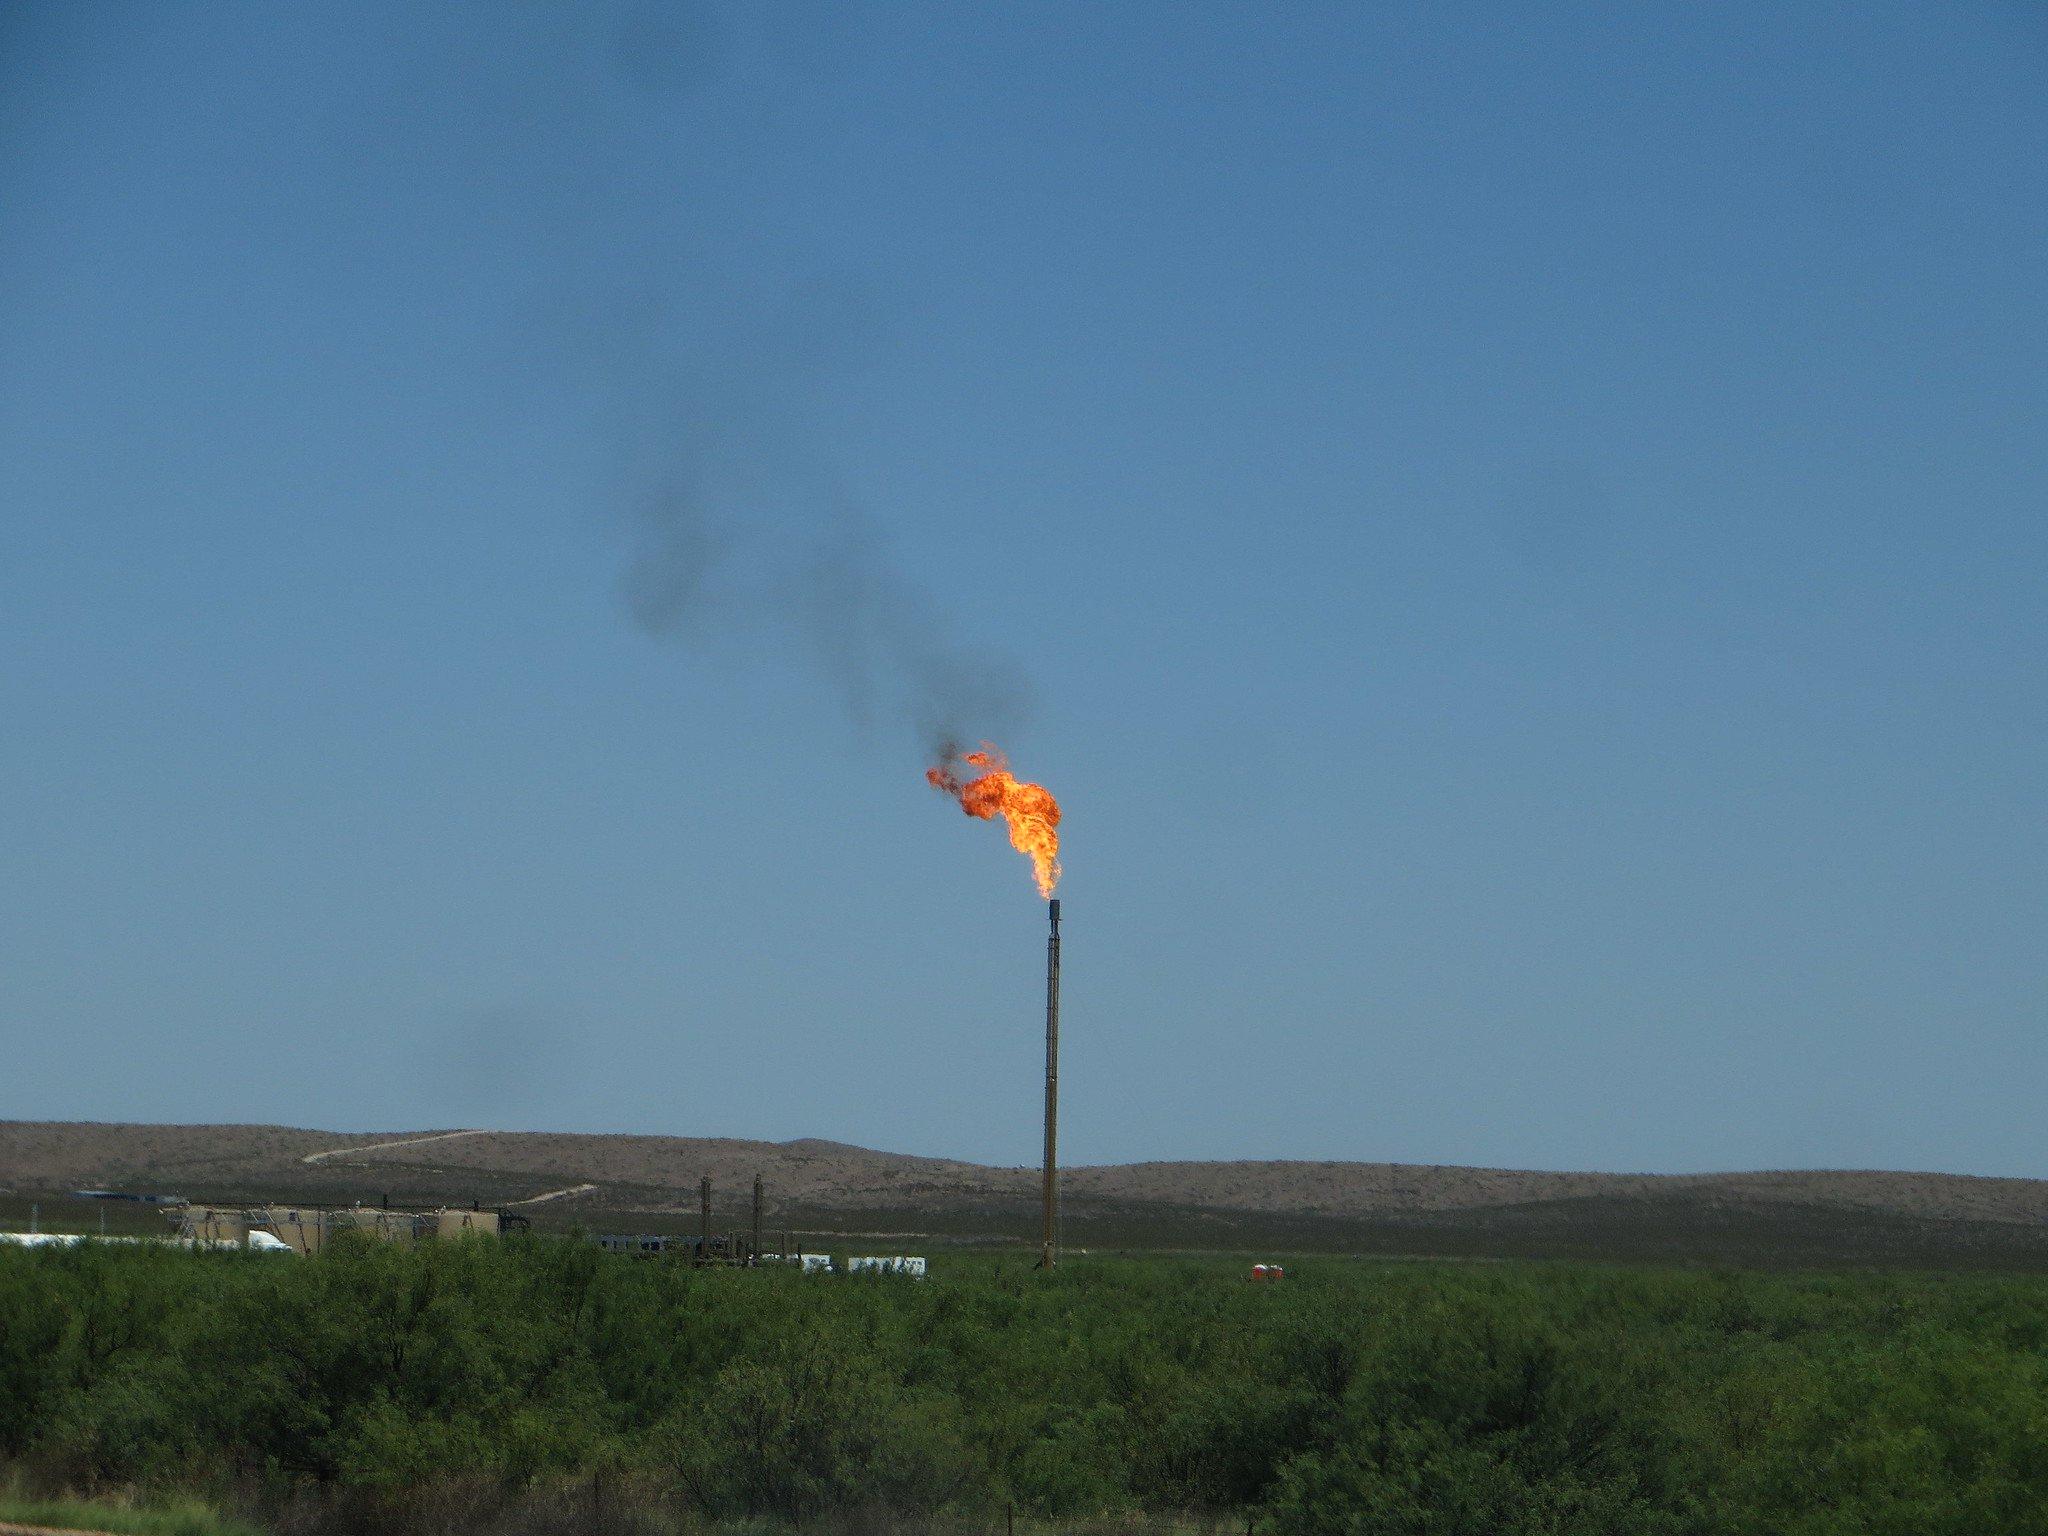 A natural gas flare in Balmorhea.